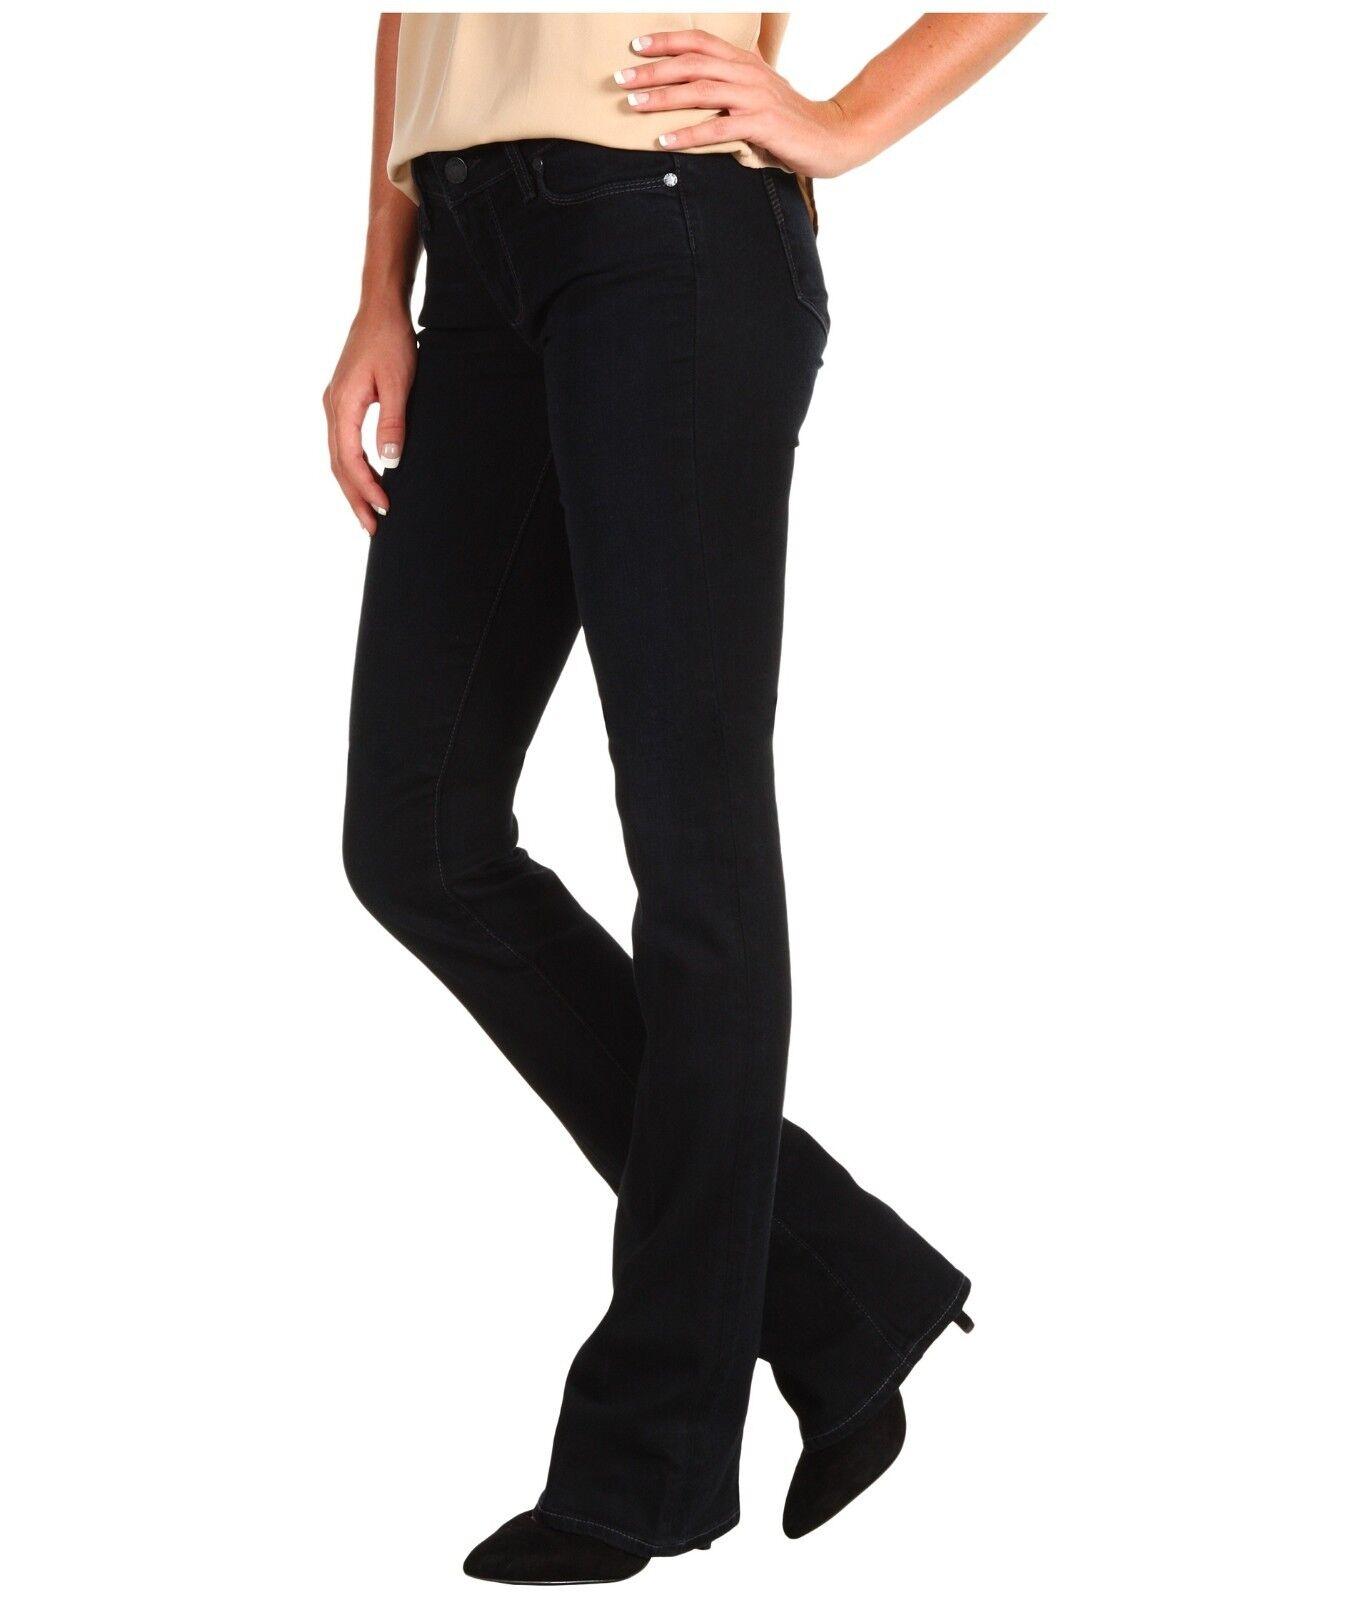 NWT  Paige Premium Denim LAGUNA JULE Slim Bootcut Jeans  SZ 23 Women Stretch